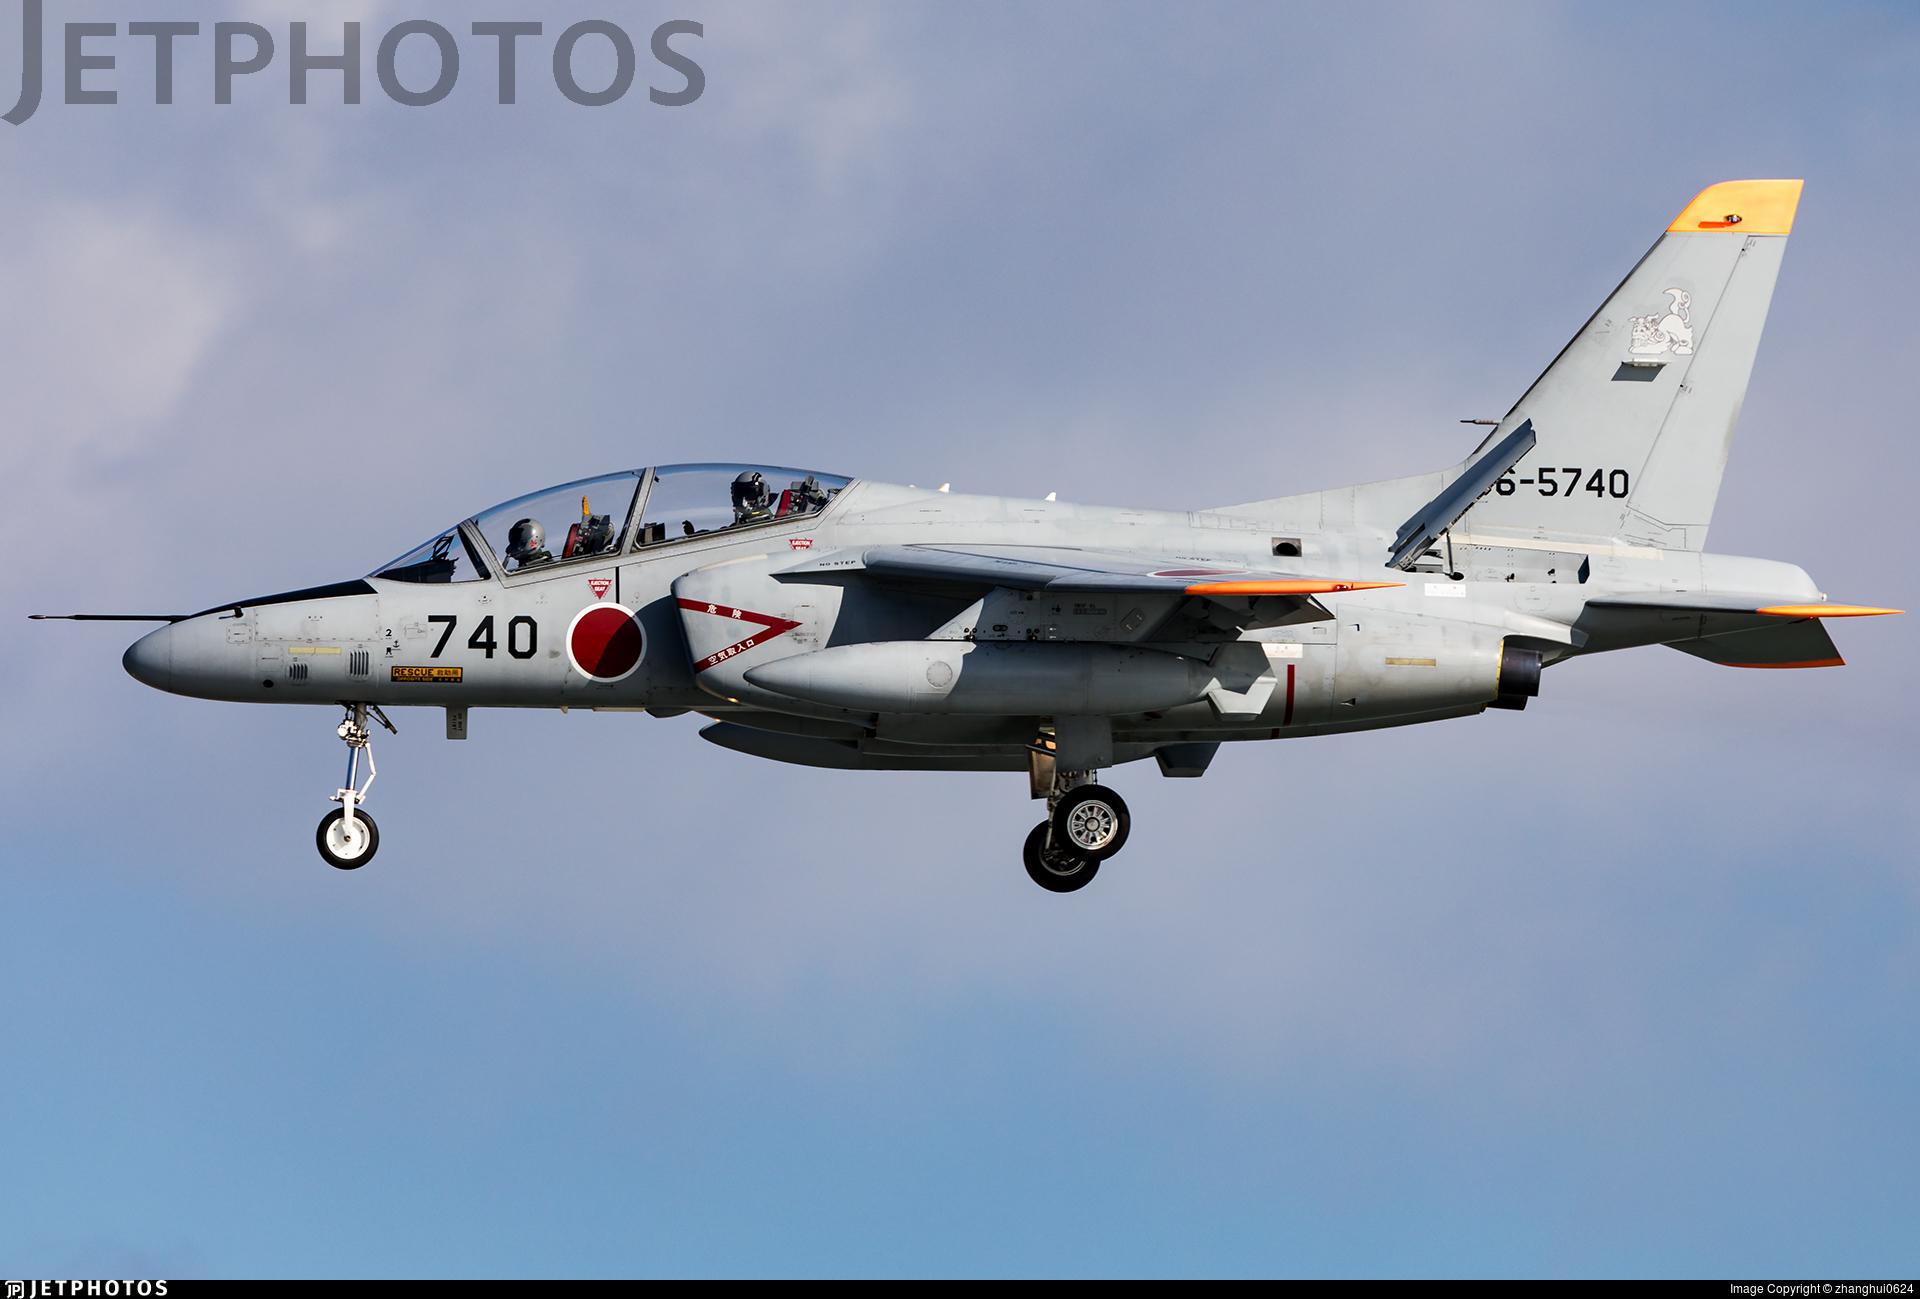 56-5740 - Kawasaki T-4 - Japan - Air Self Defence Force (JASDF)